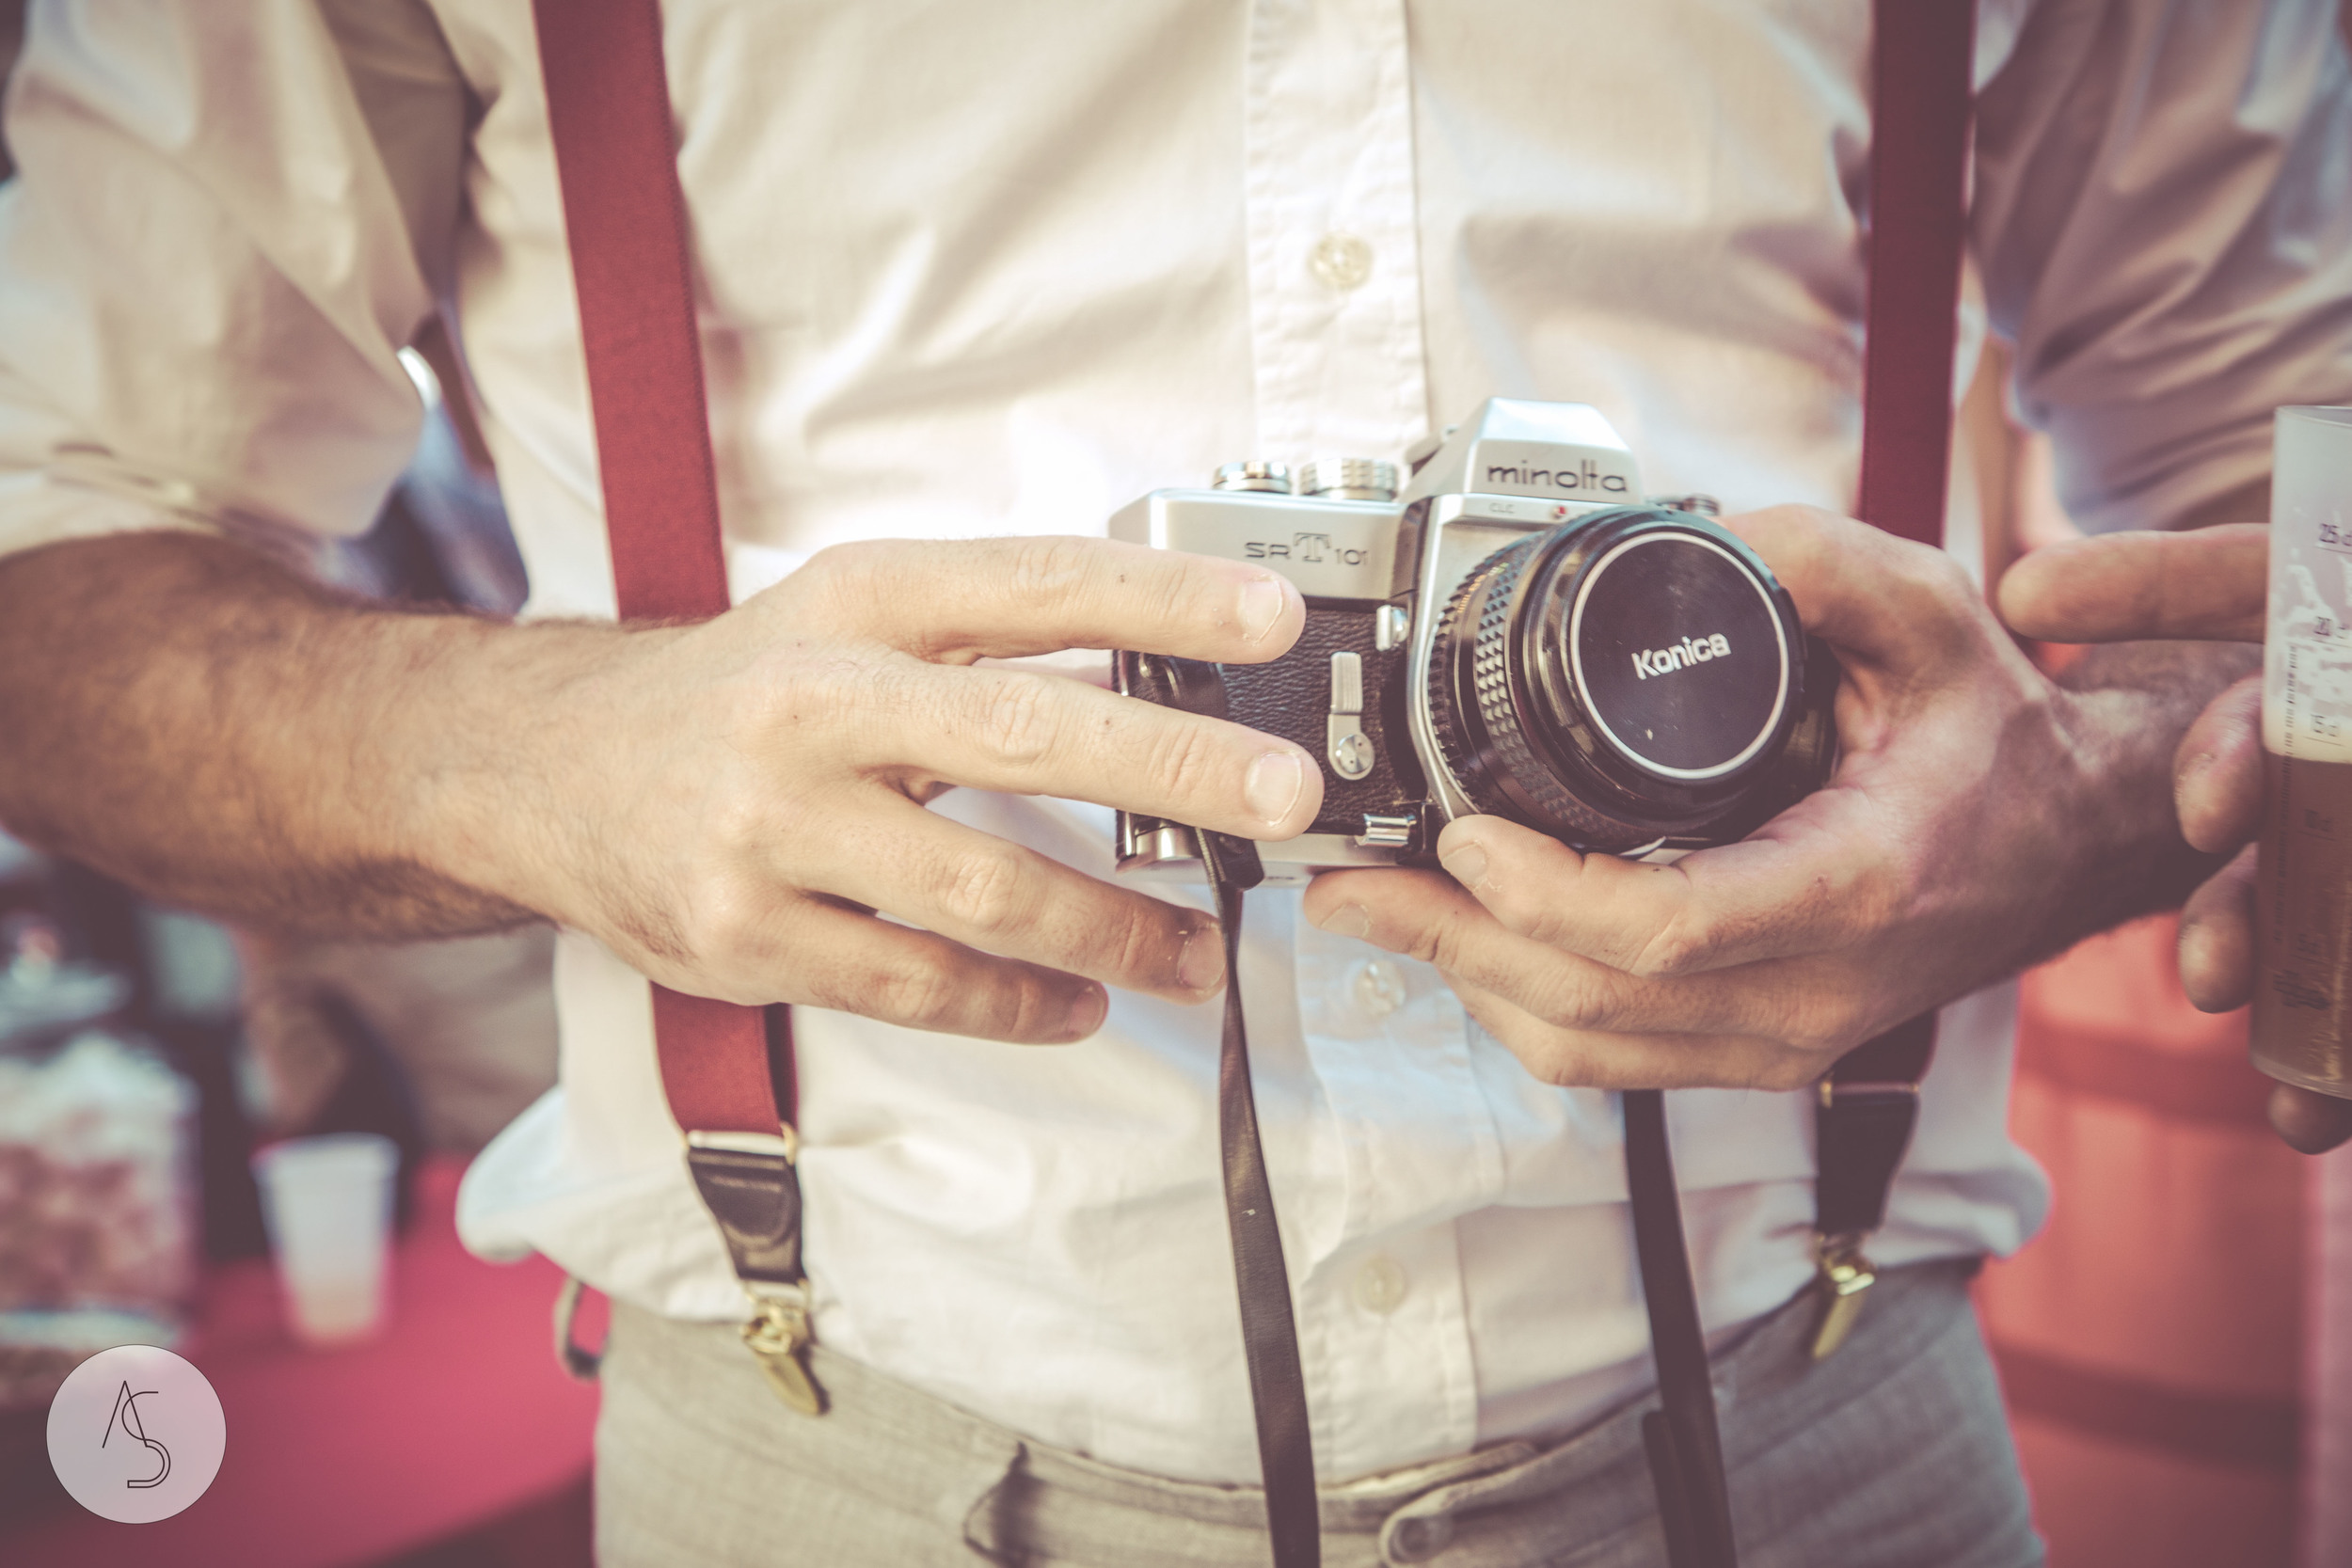 photographe mariage - Grenoble - Rhone Alpes - Adriana Salazar photo-129.jpg